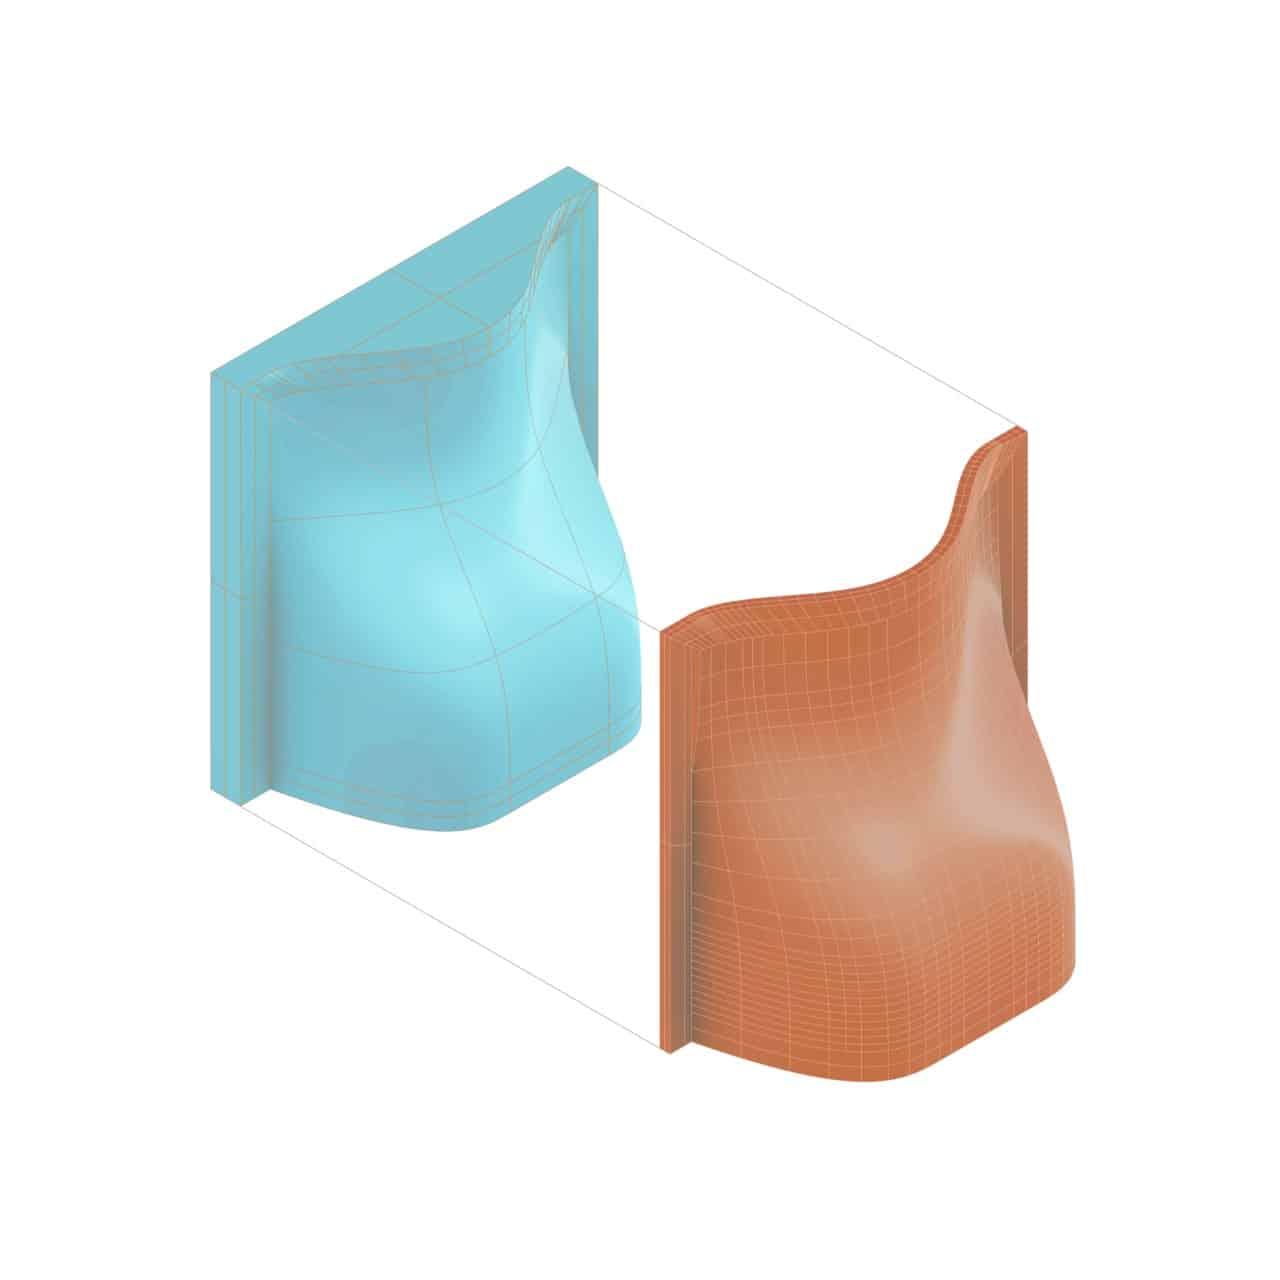 cfrp-make-pattern-step-3-create-mold-from-pattern